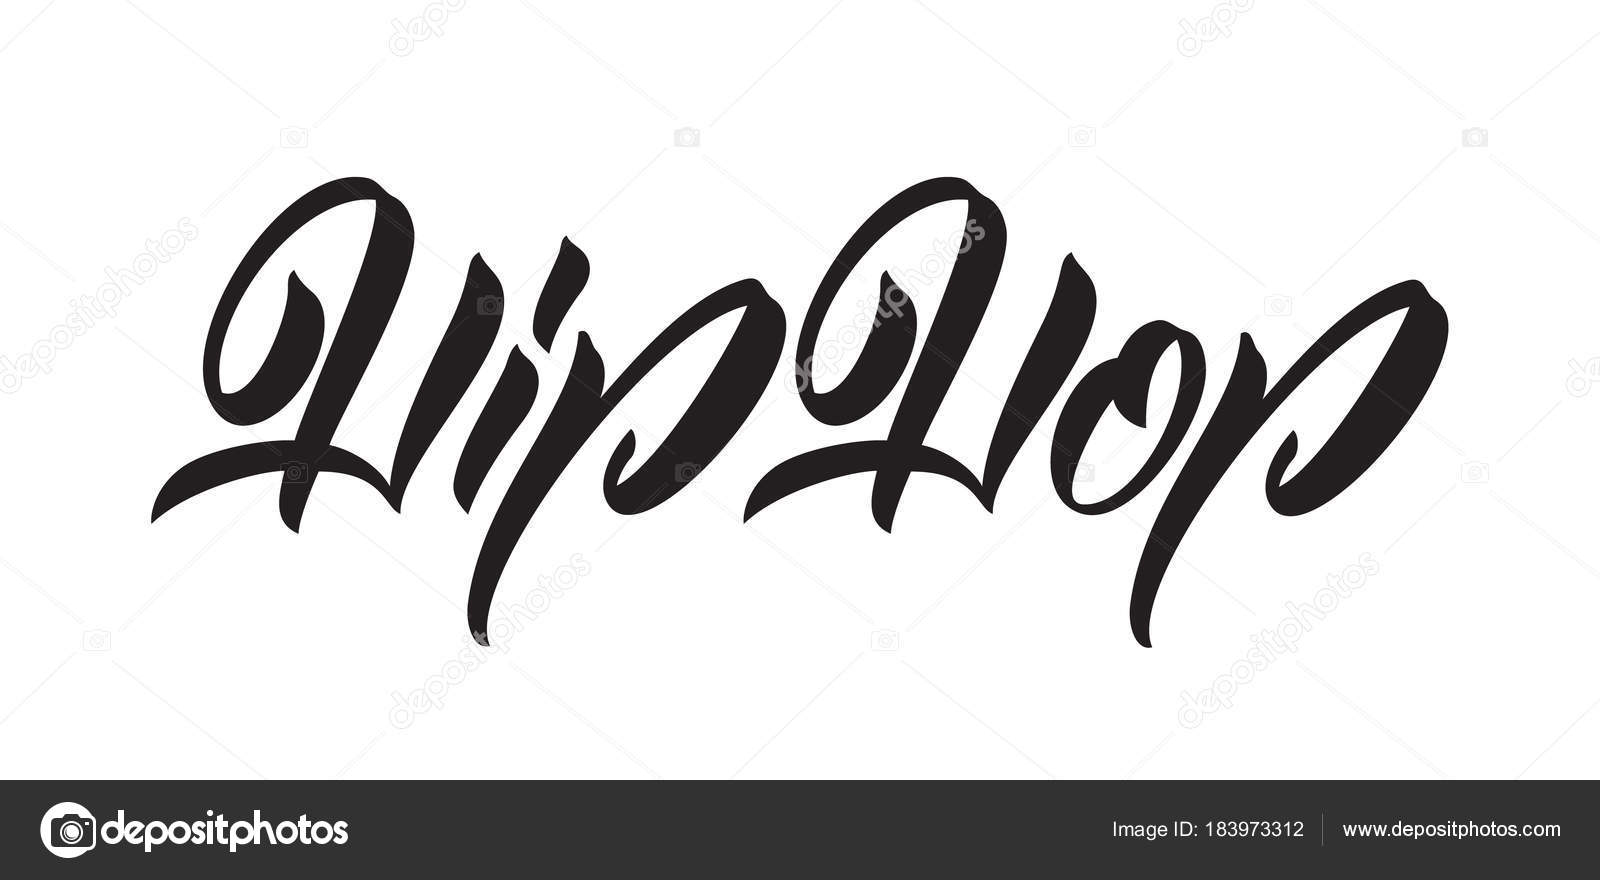 vektor illustration handschriftliche kalligraphische typ. Black Bedroom Furniture Sets. Home Design Ideas